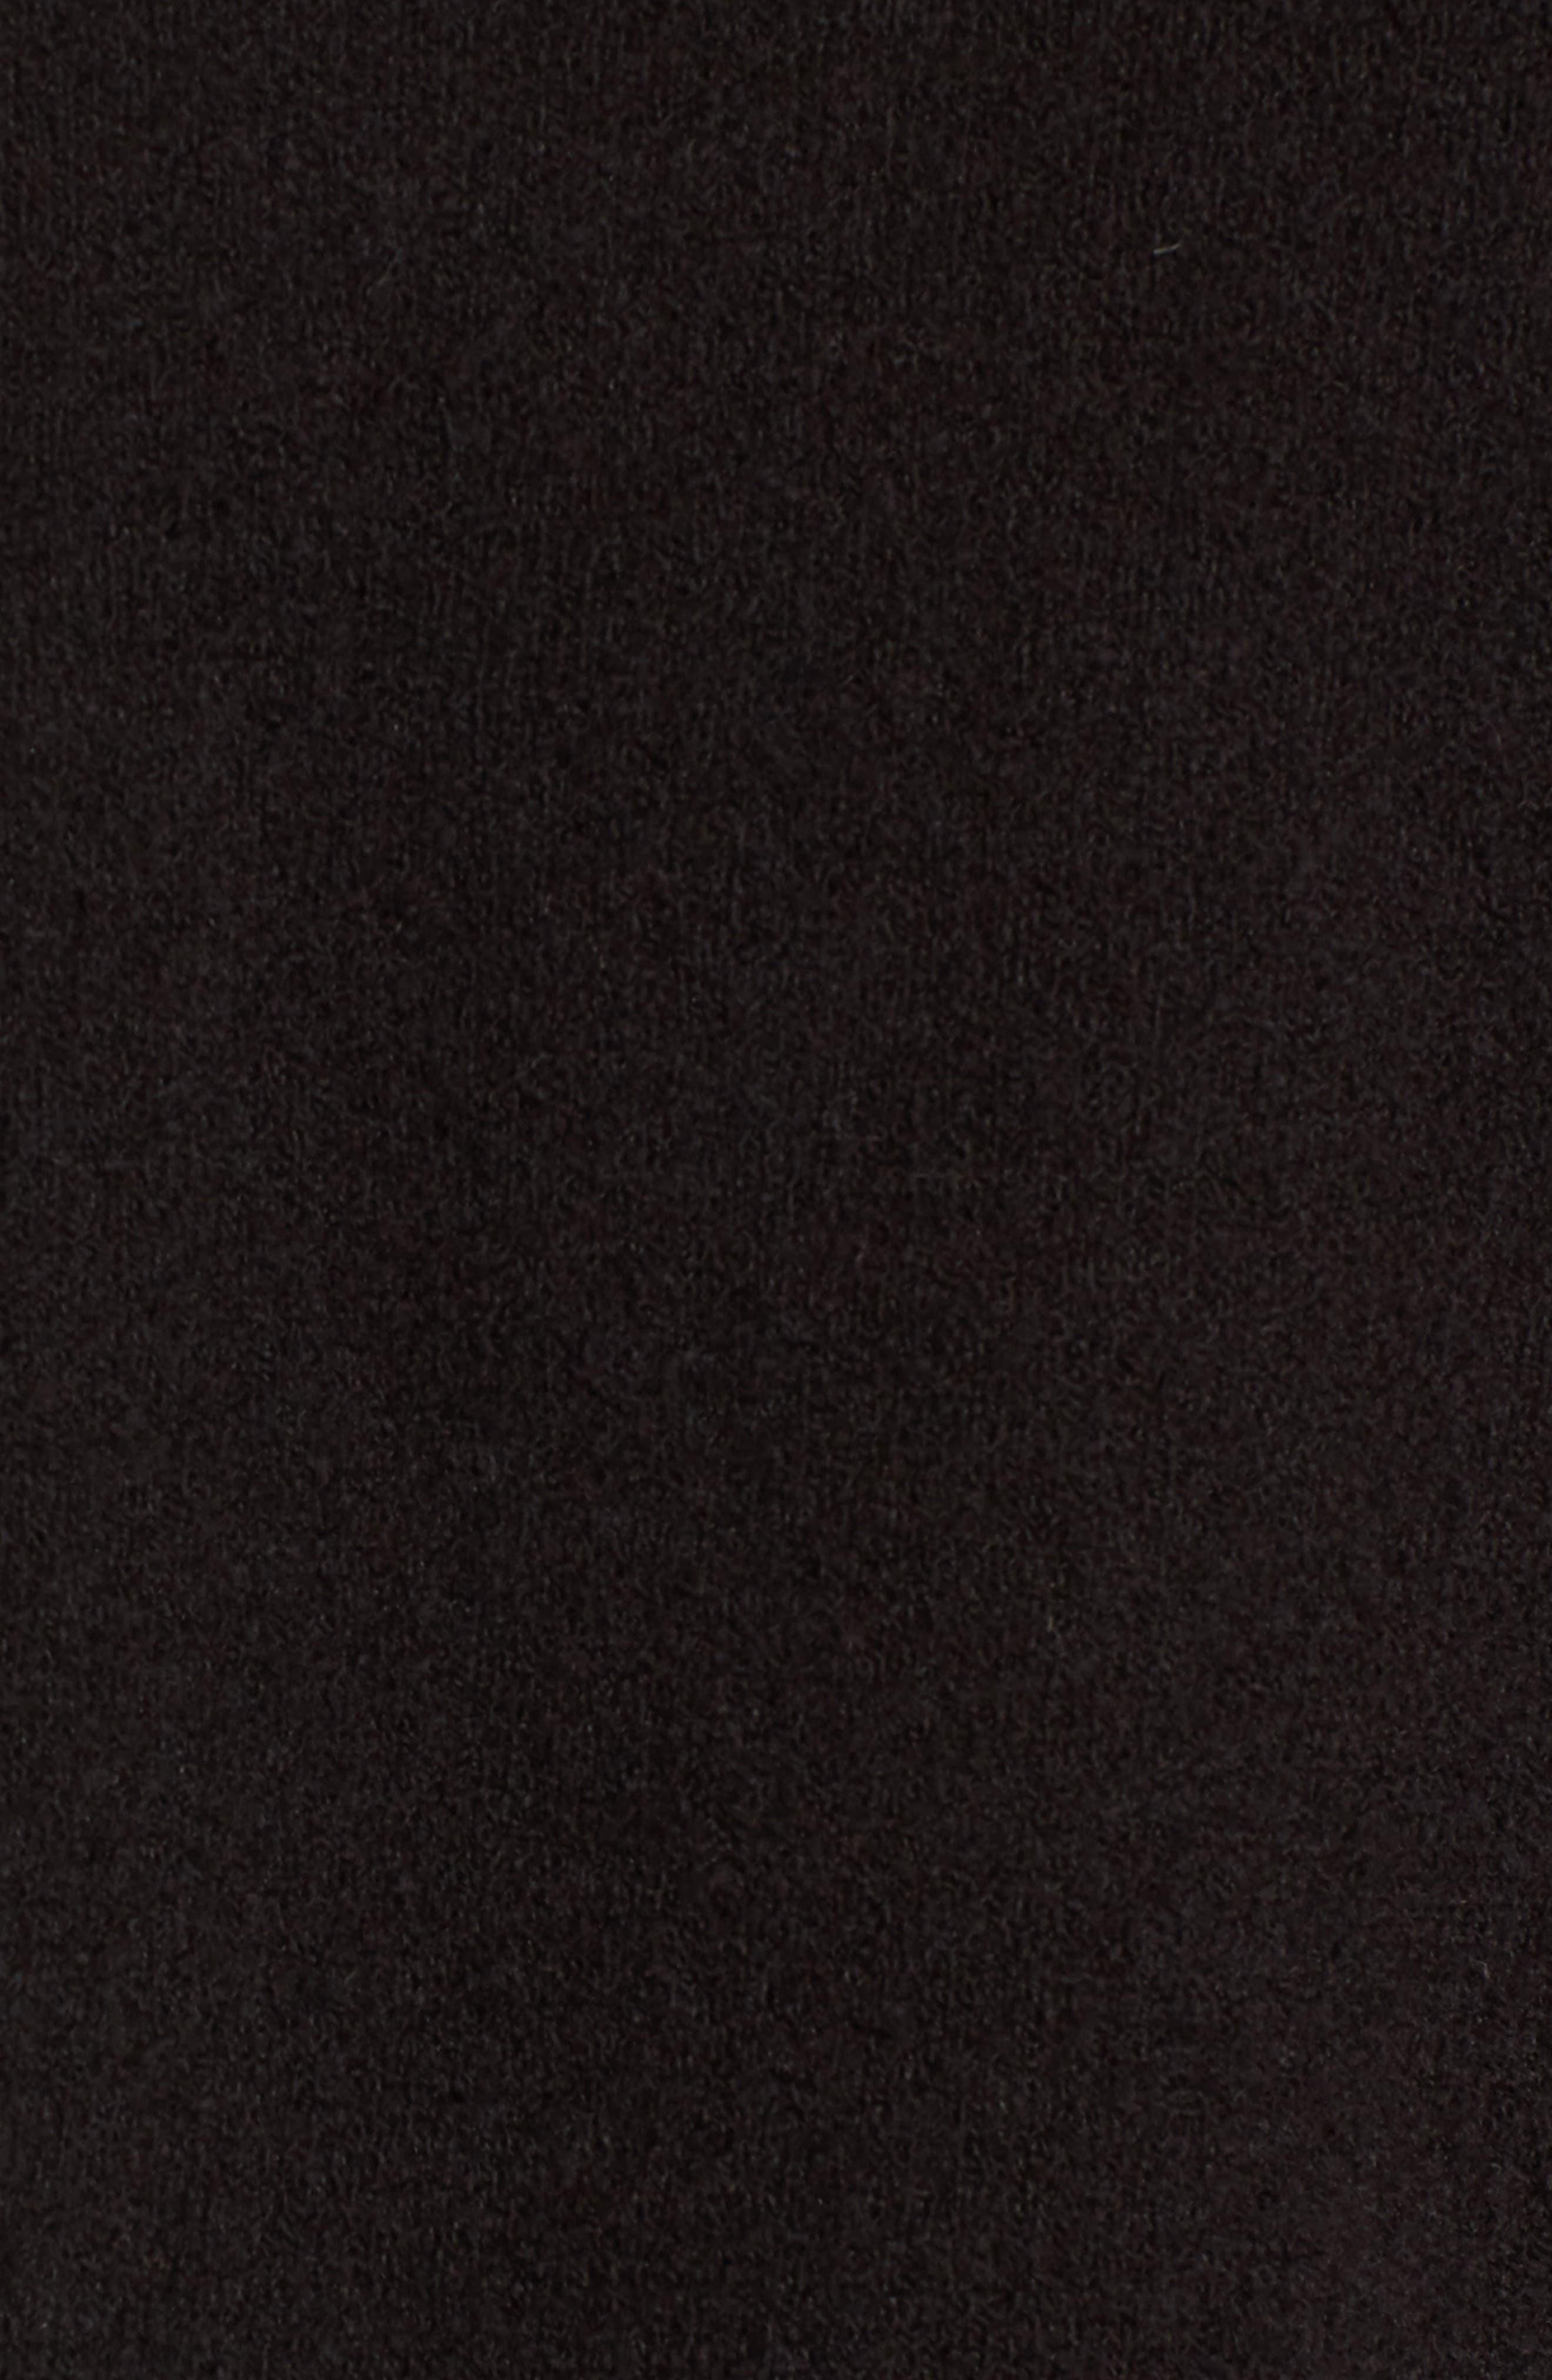 Ruffle Sleeve Sweater,                             Alternate thumbnail 5, color,                             001